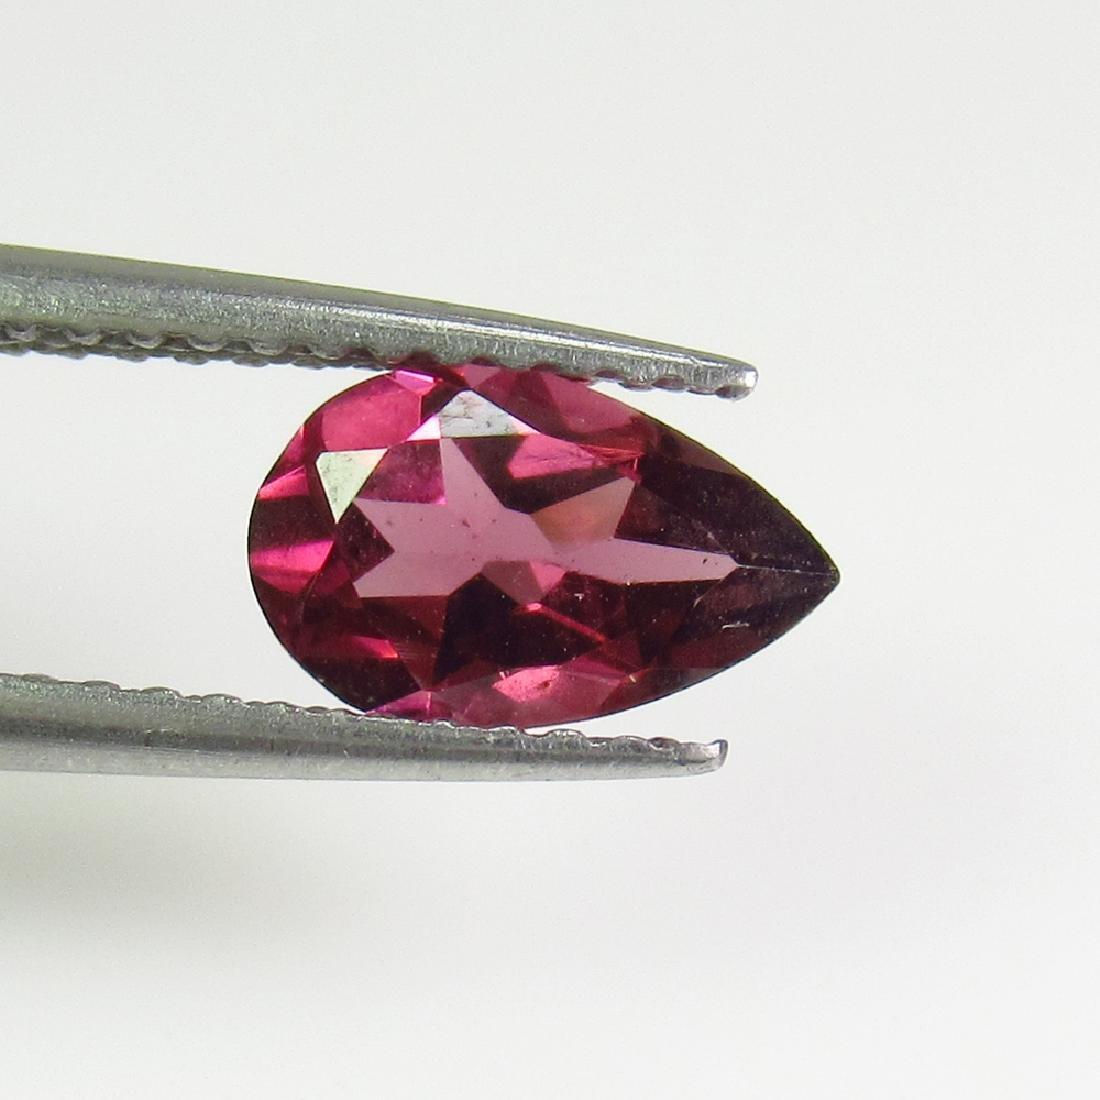 1.05 Ctw Natural Pink Rhodolite Garnet 8X5 mm Pear Cut